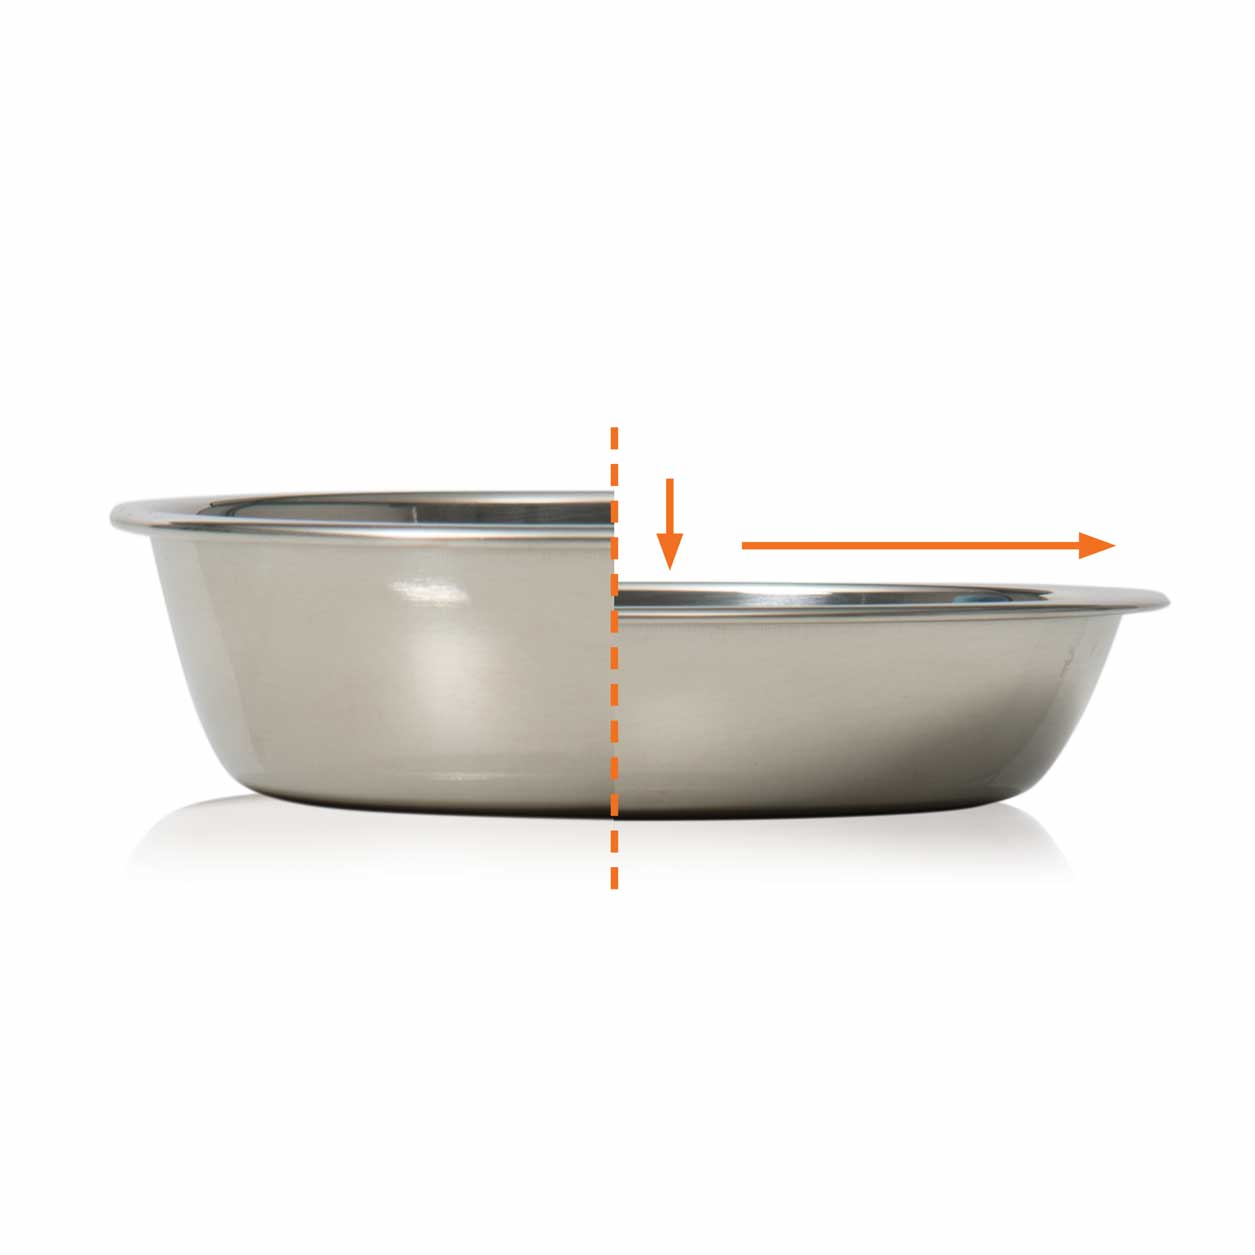 Feeding dish with shallow design